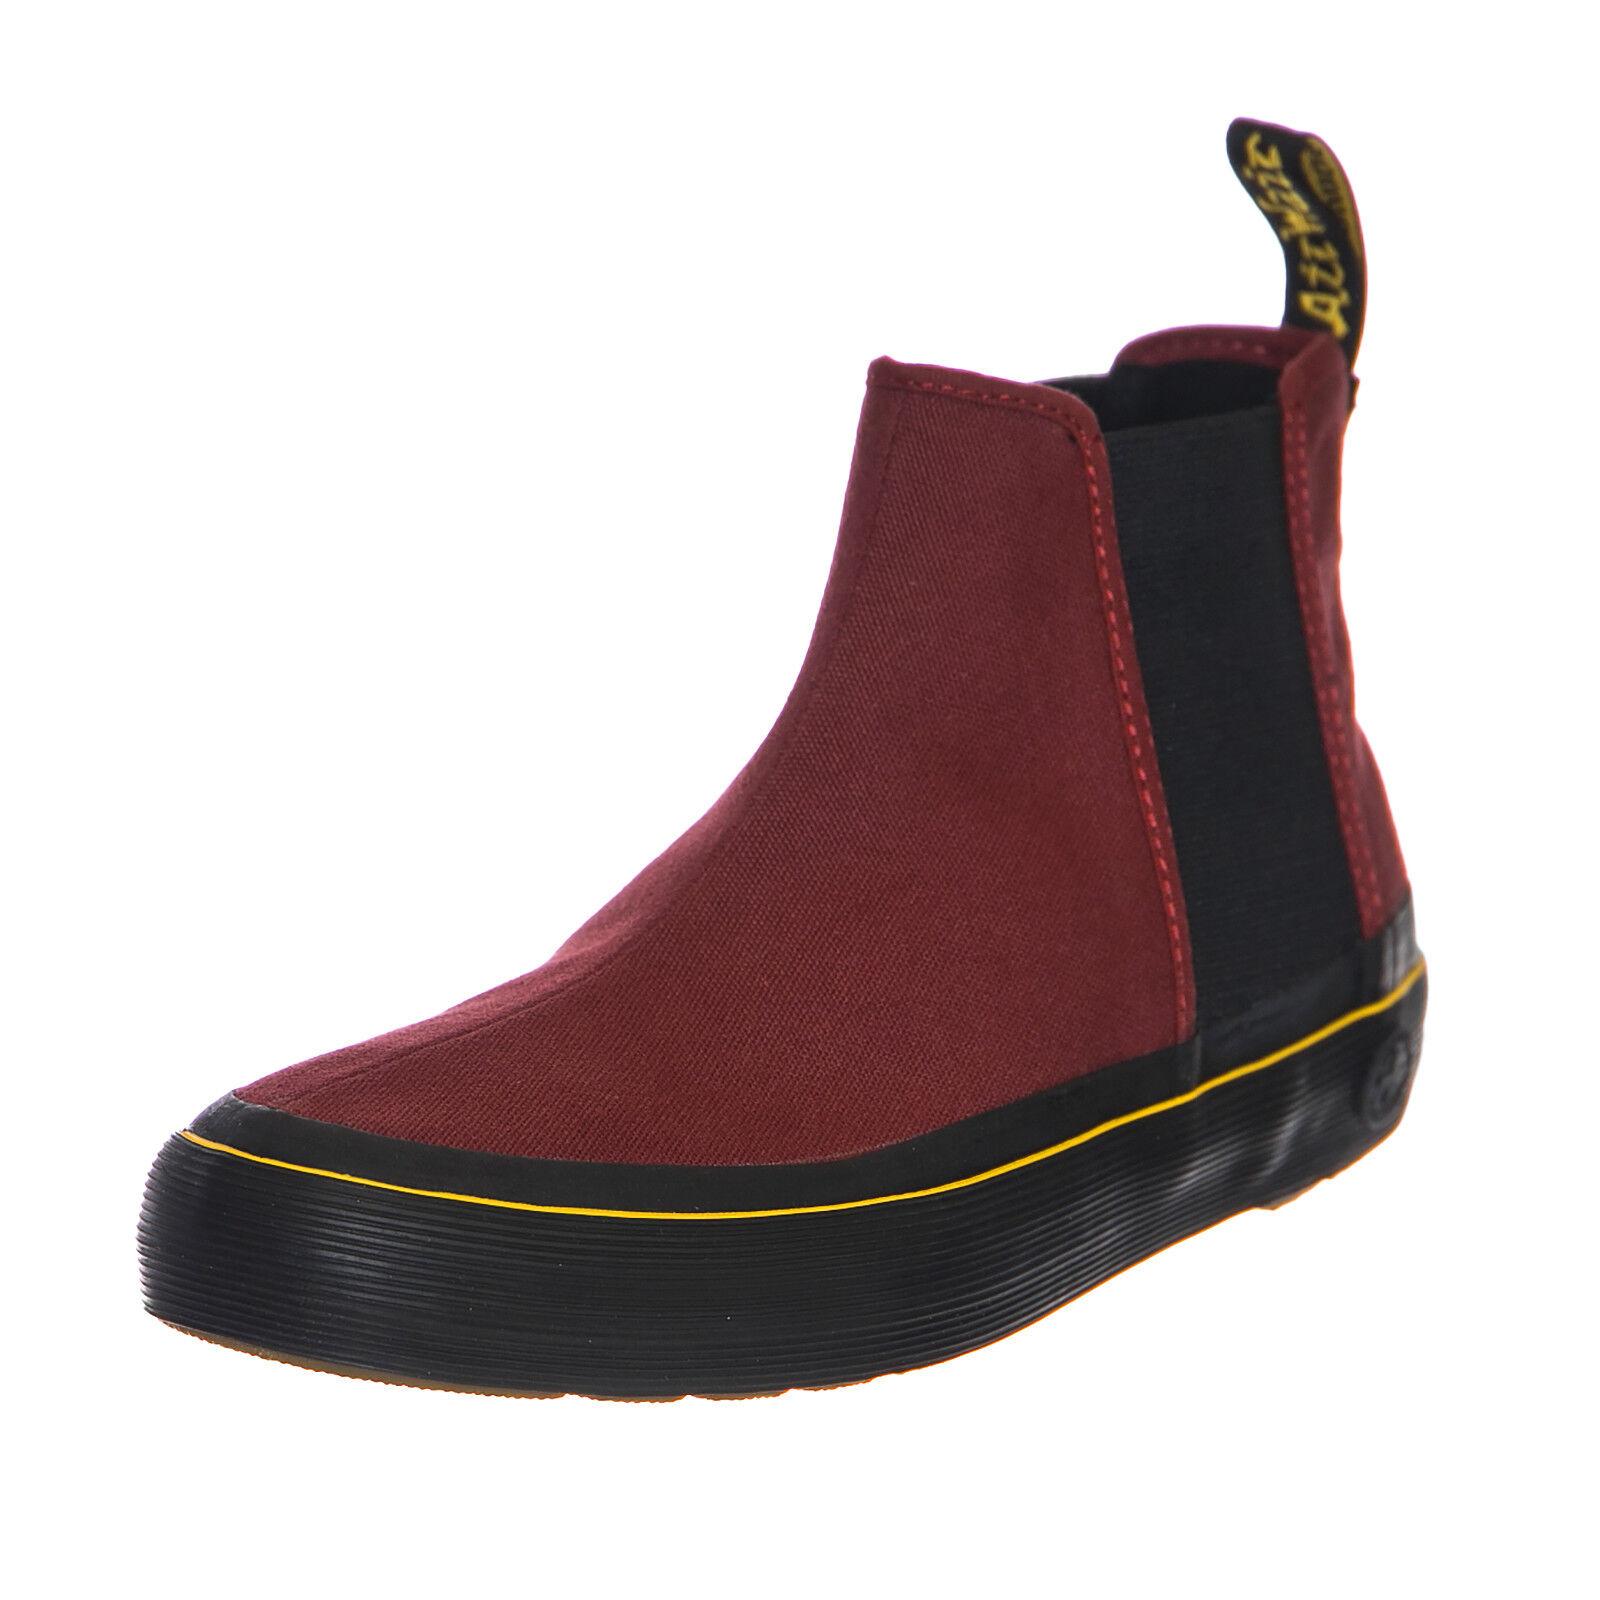 Dr.Martens scarpe da ginnastica Phoebe Cherry rosso Canvas Bordeaux